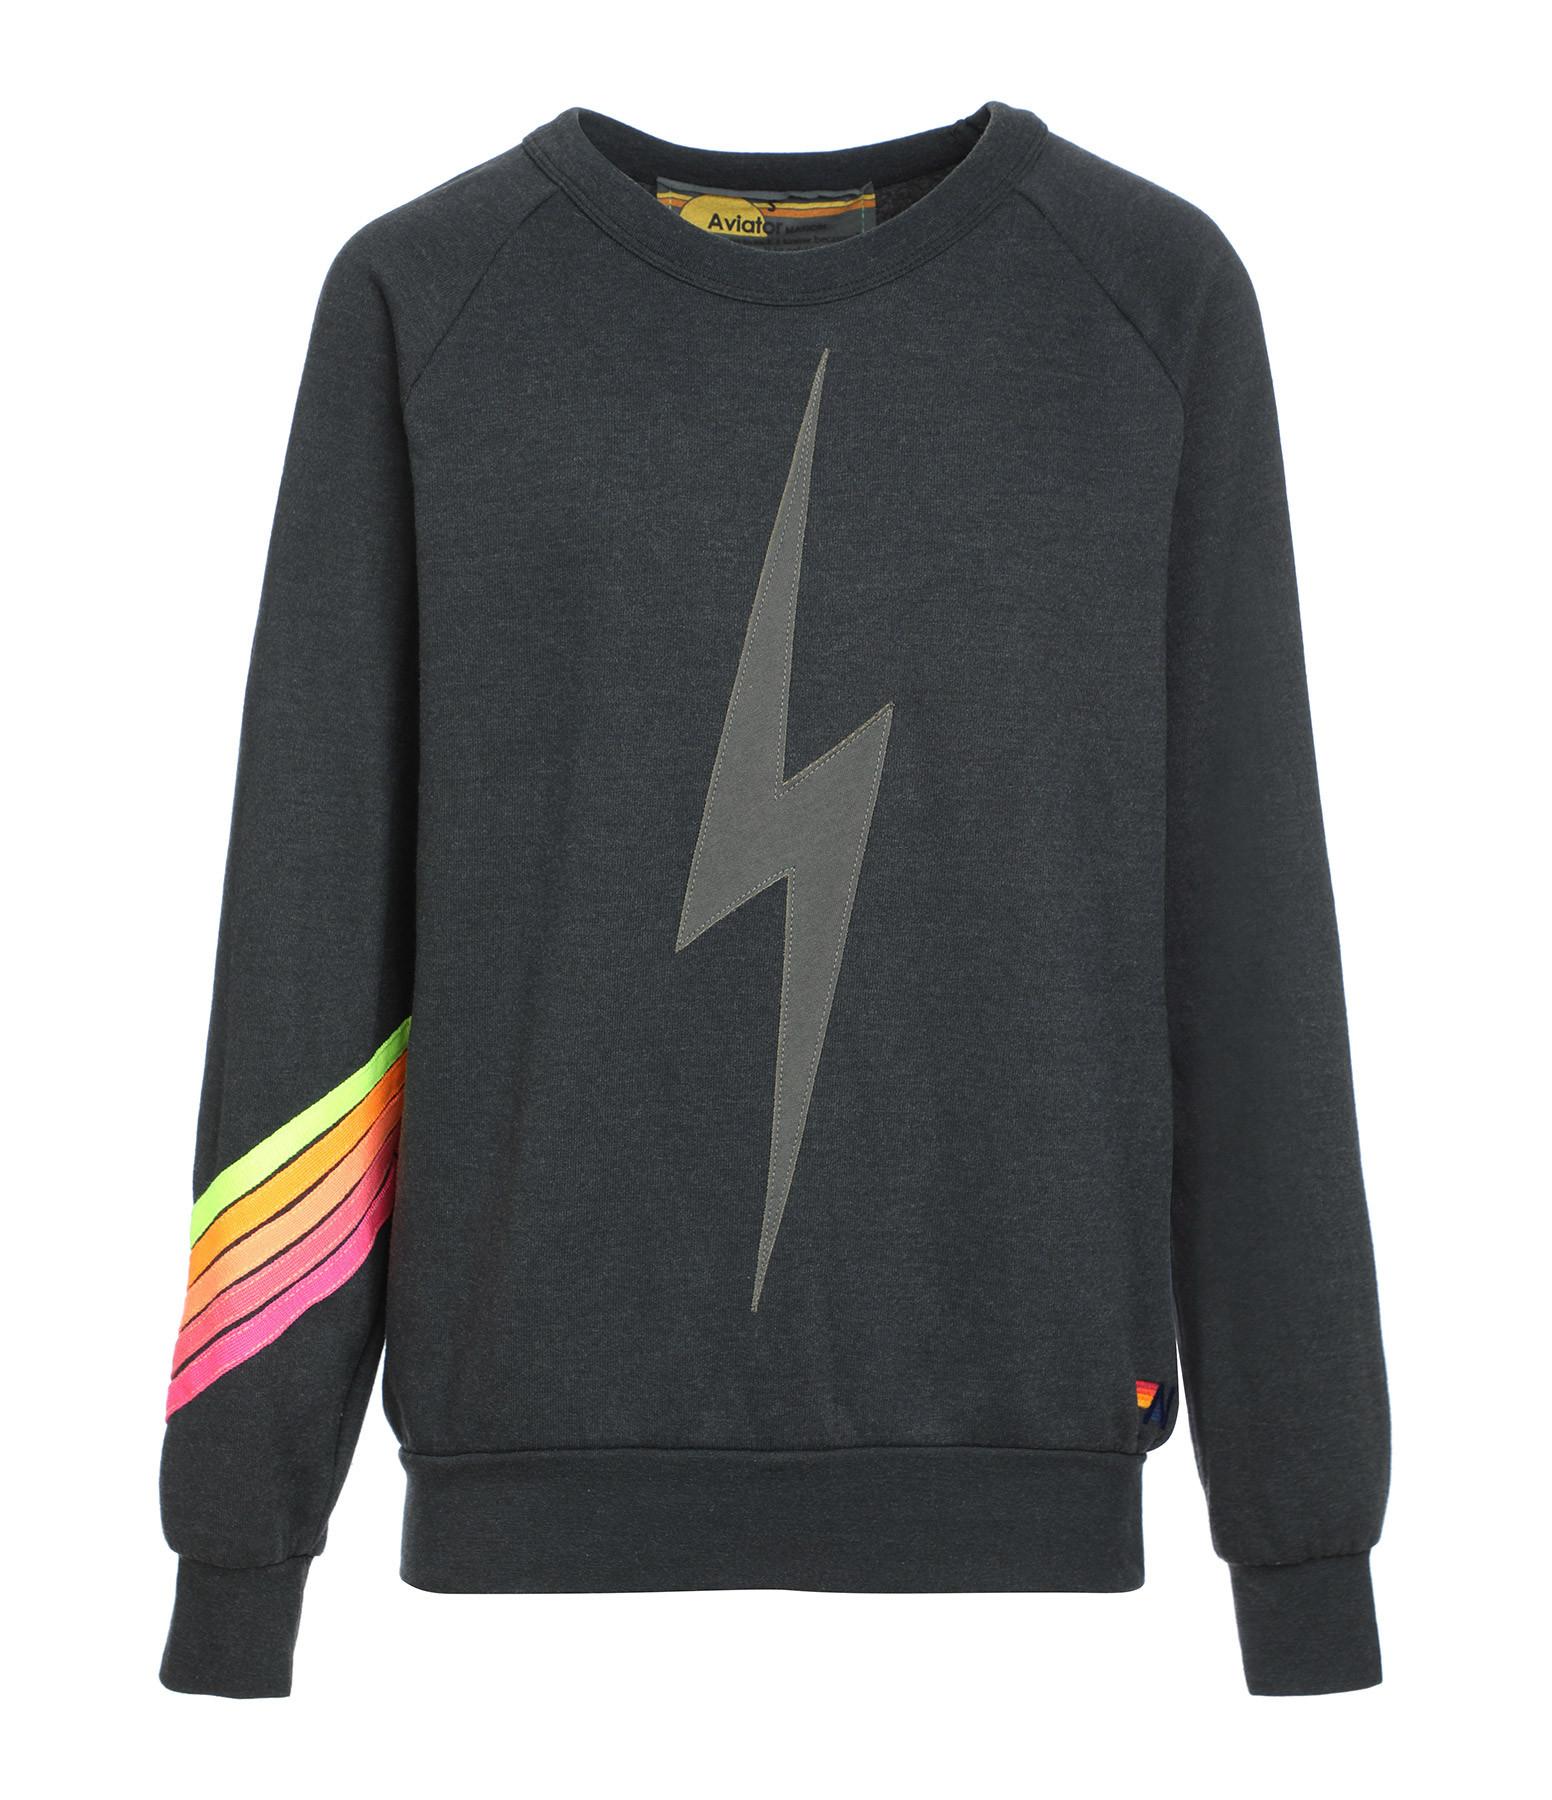 AVIATOR NATION - Sweatshirt Bolt Charbon Néon